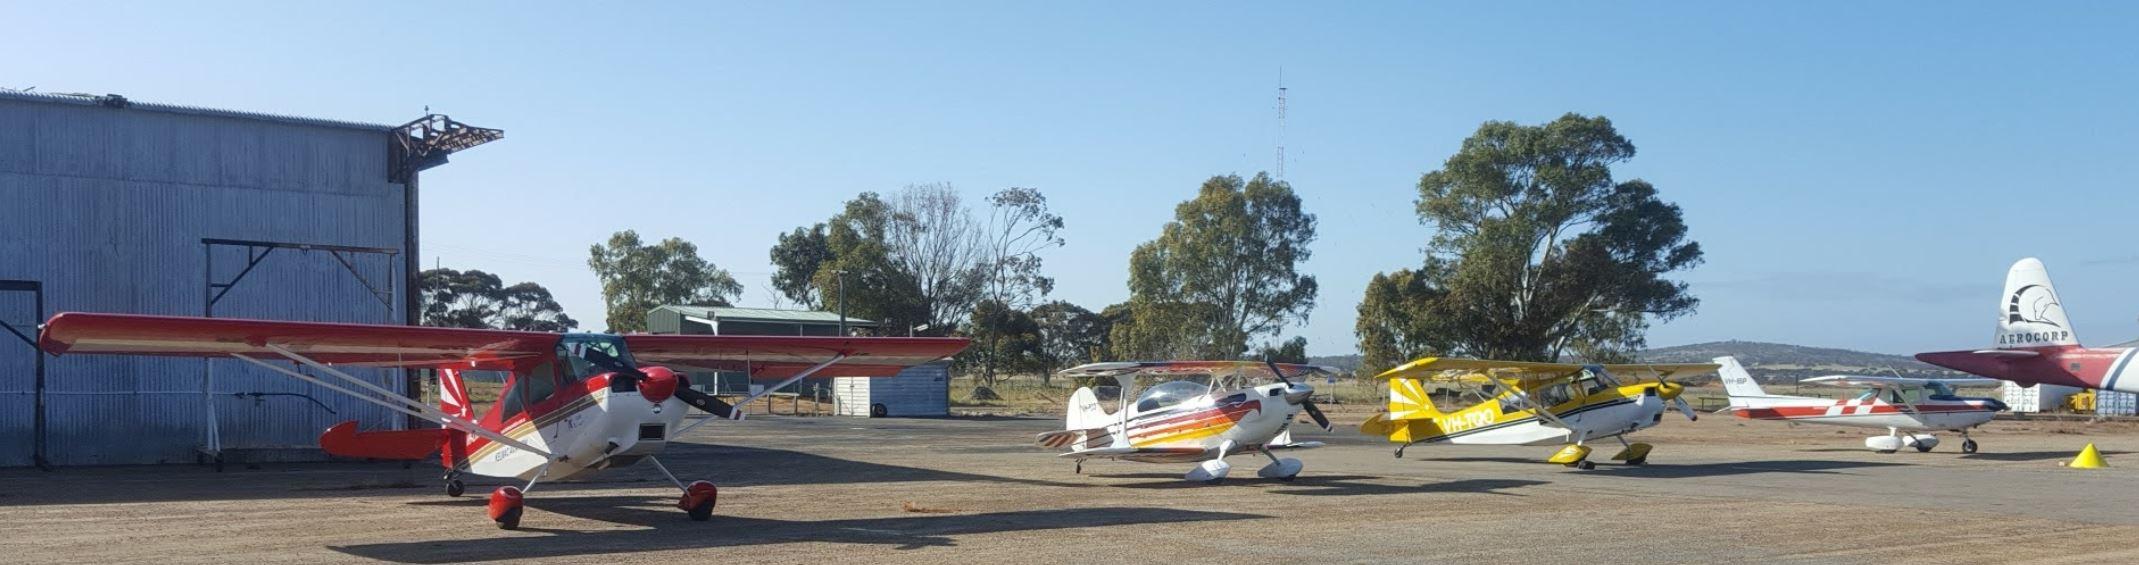 Planes at YCUN